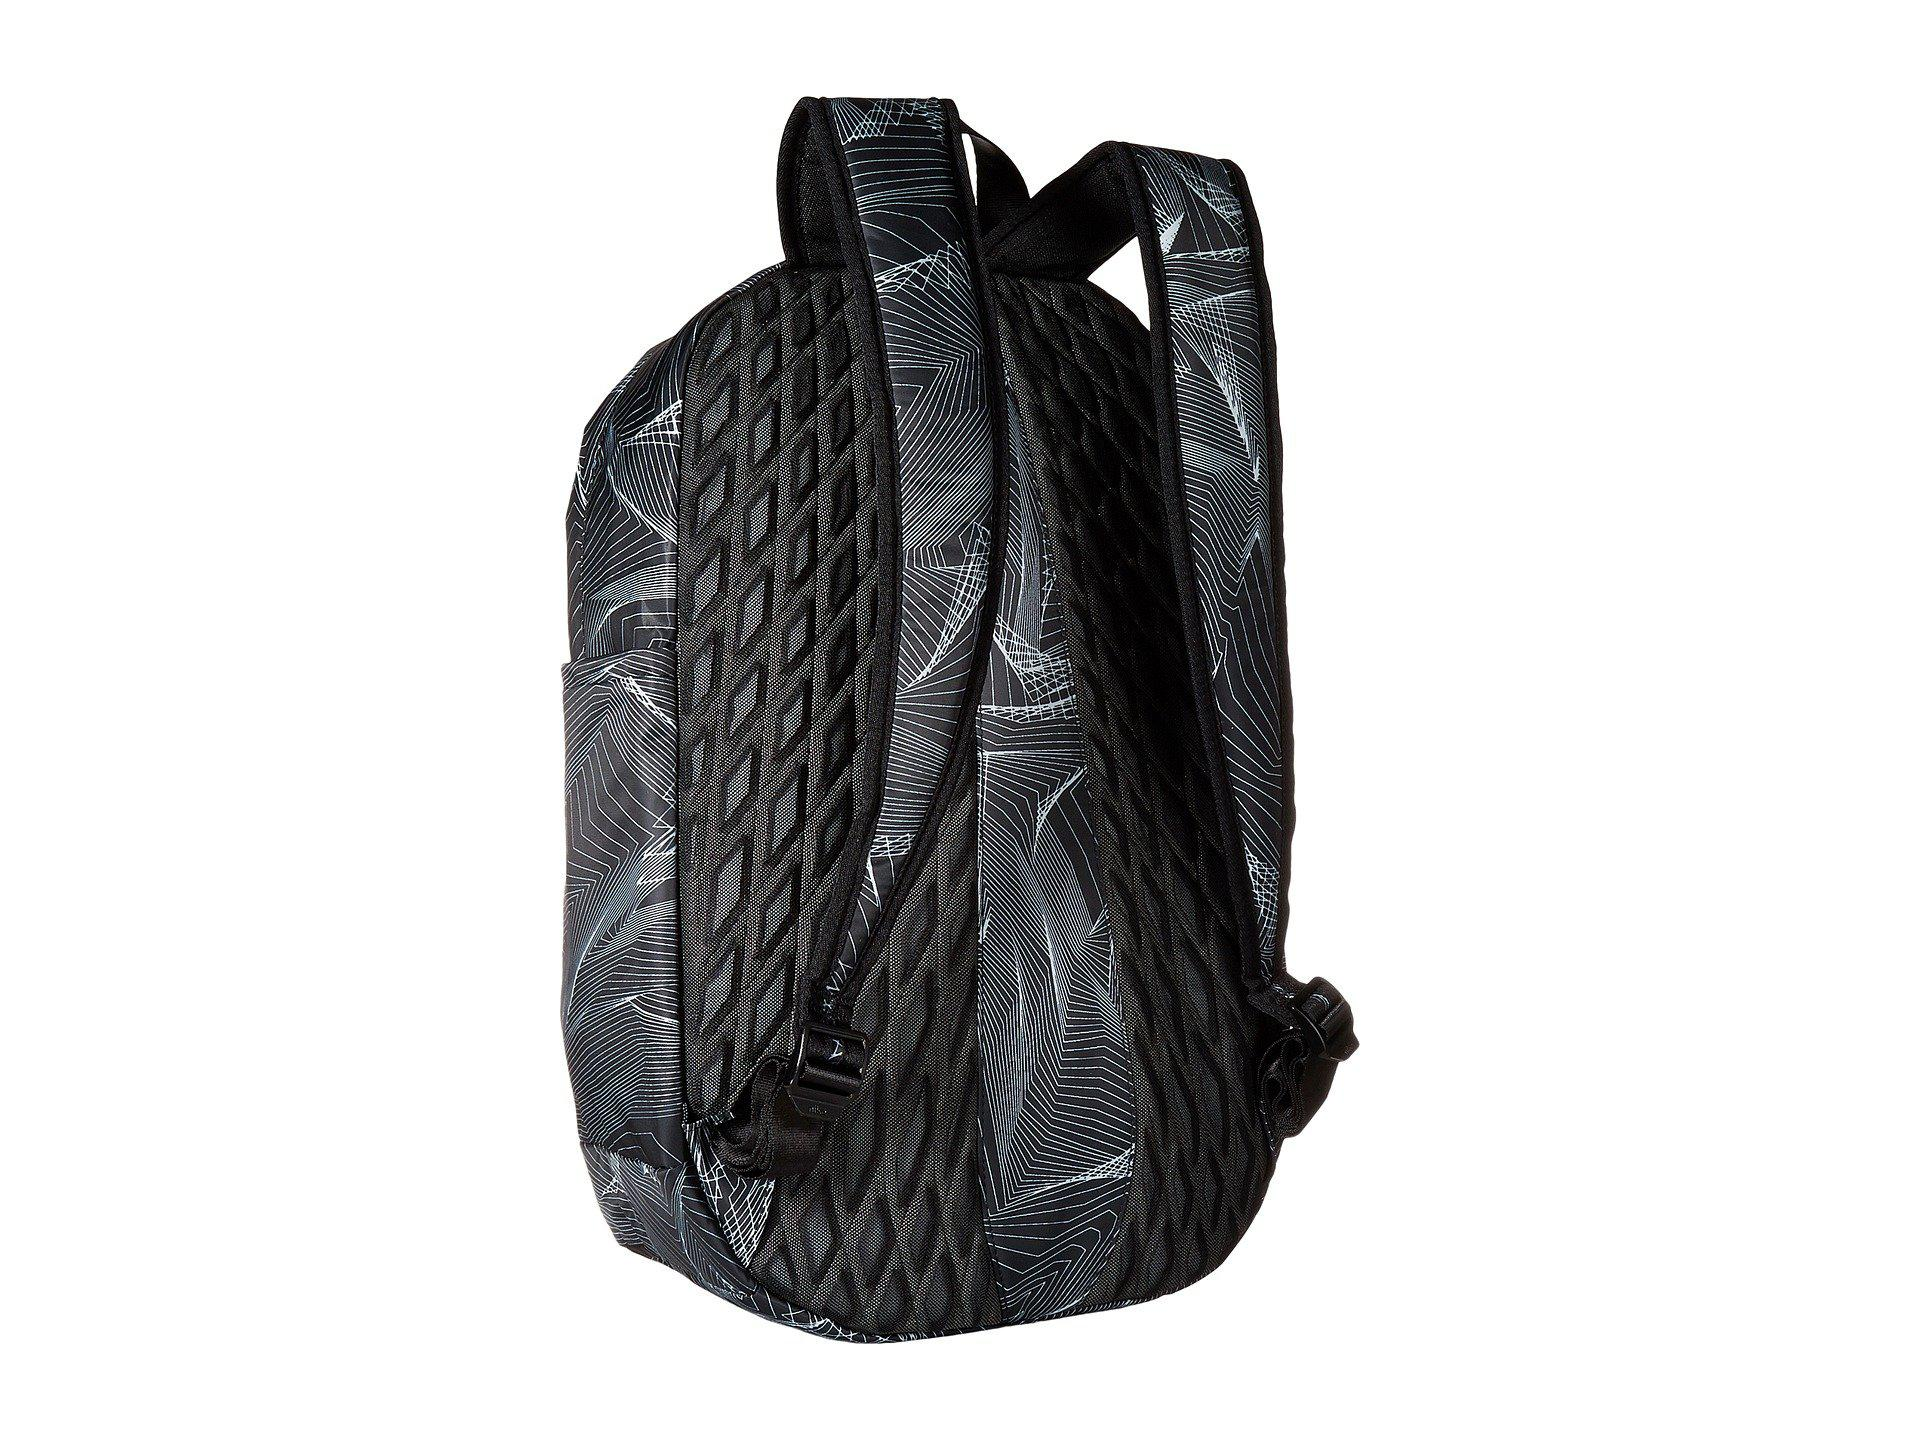 e8121ec5d396 Lyst - Nike Auralux Backpack - Print in Black